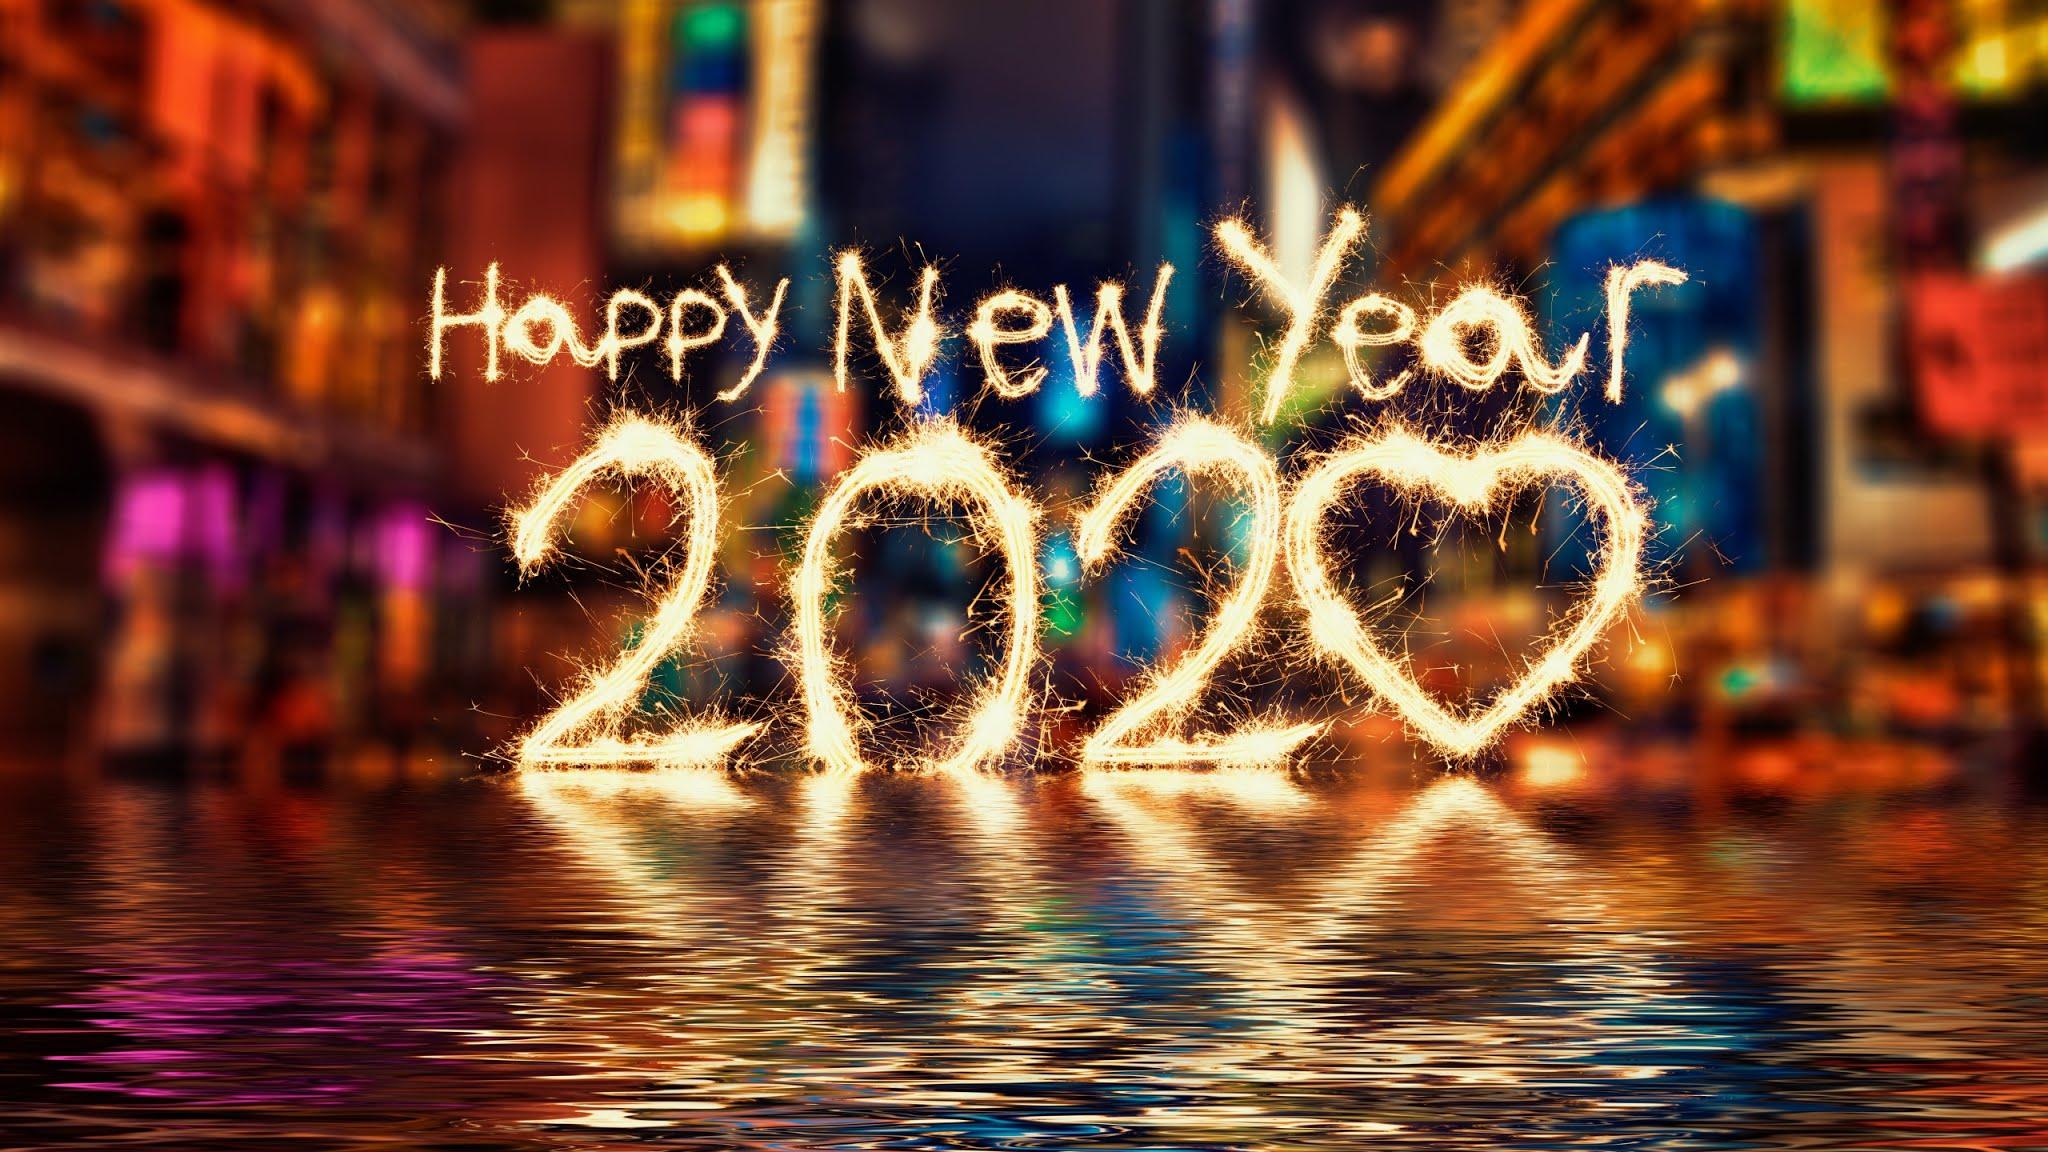 Happy New Year Wallpaper 2048x1152